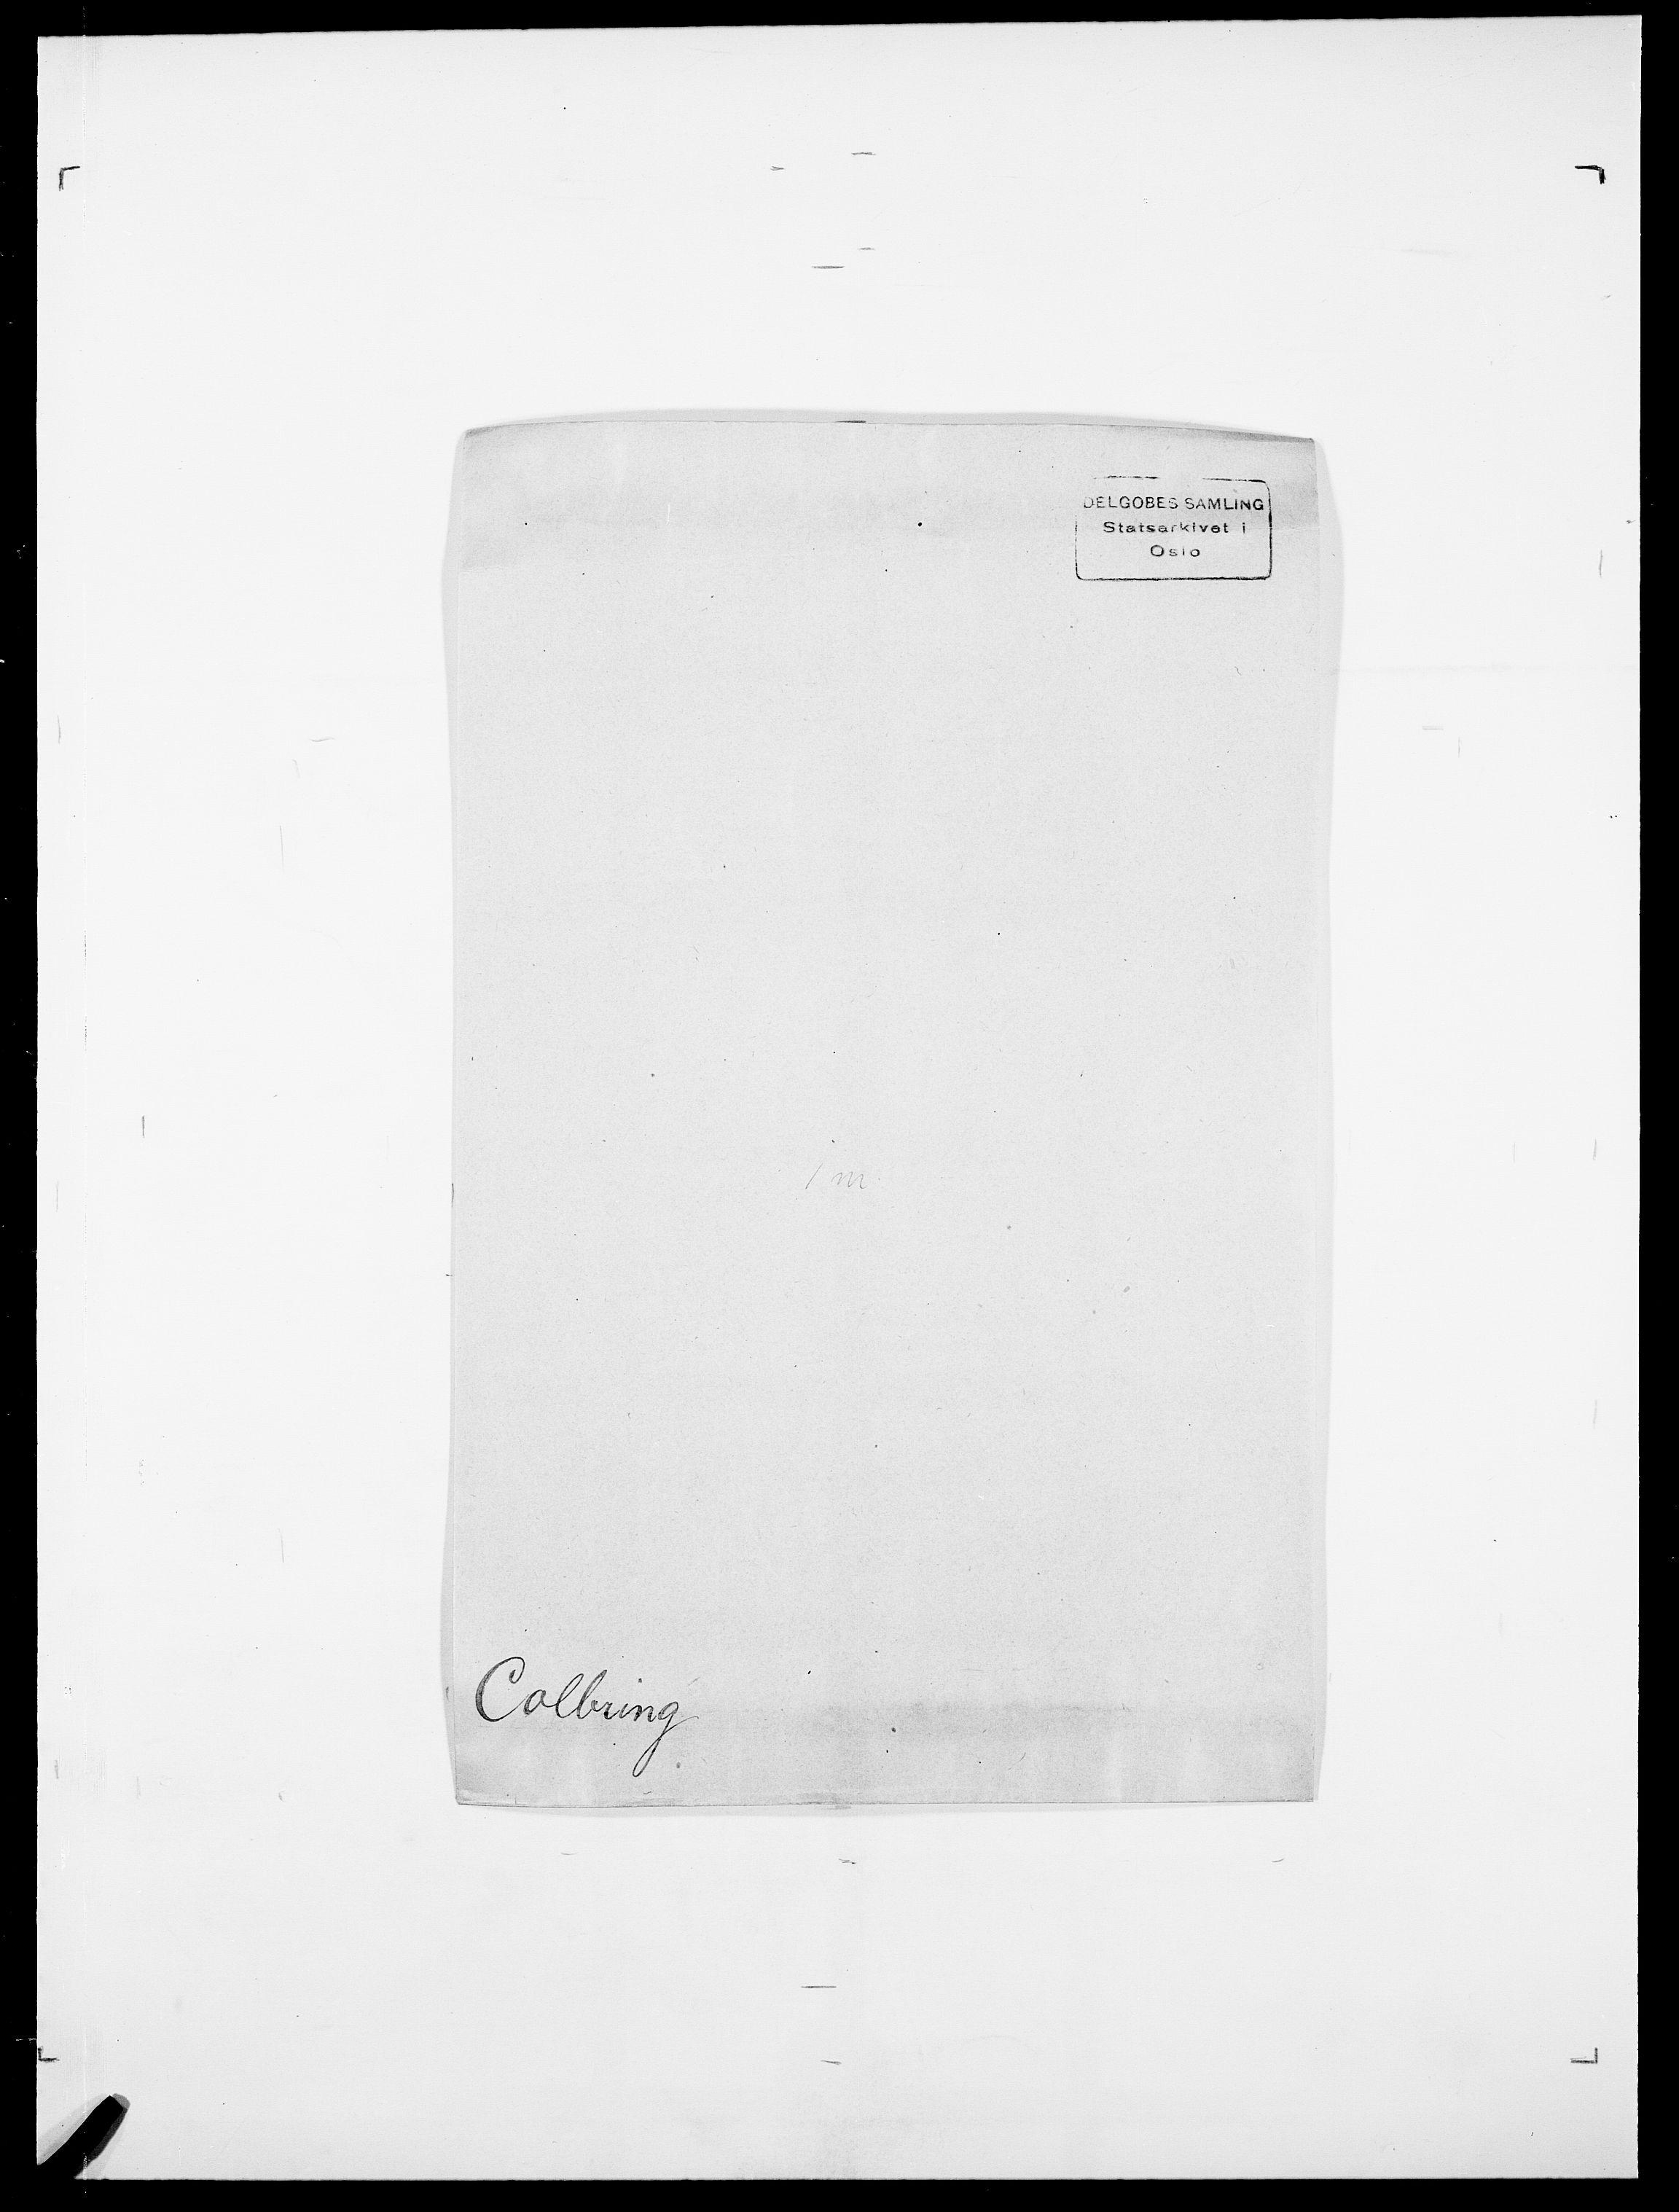 SAO, Delgobe, Charles Antoine - samling, D/Da/L0008: Capjon - Dagenbolt, s. 424